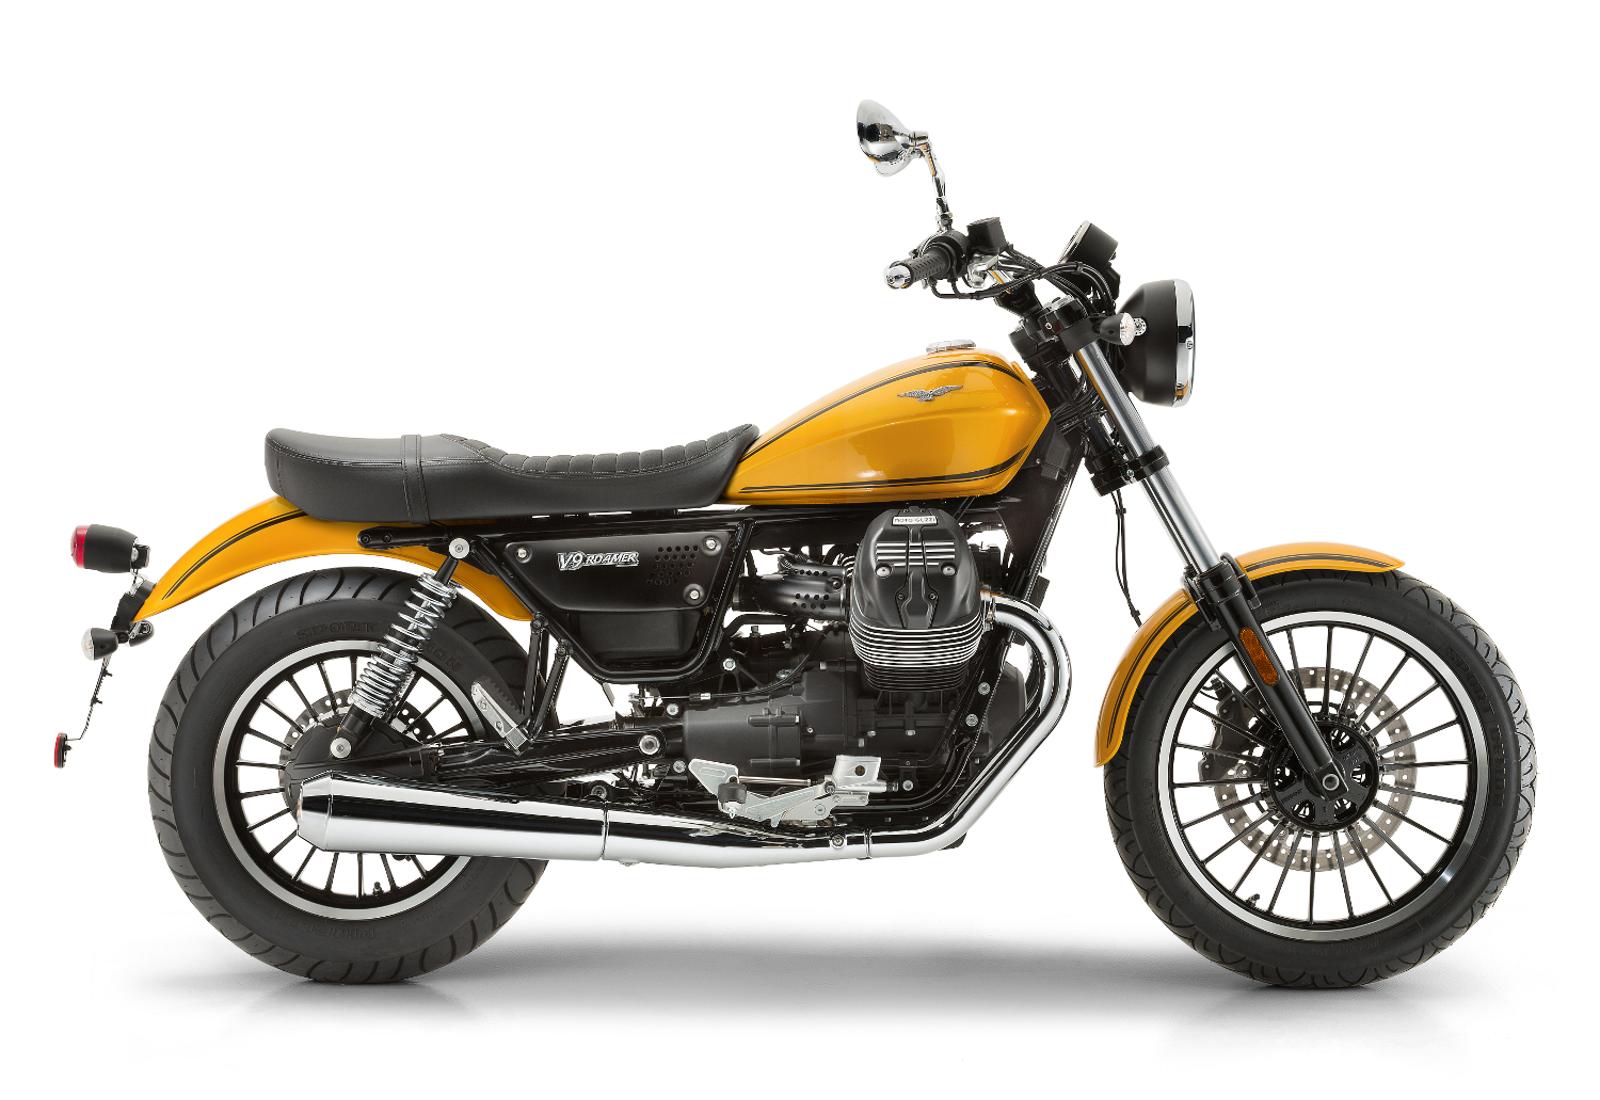 Moto Guzzi PNG-PlusPNG.com-1600 - Moto Guzzi PNG